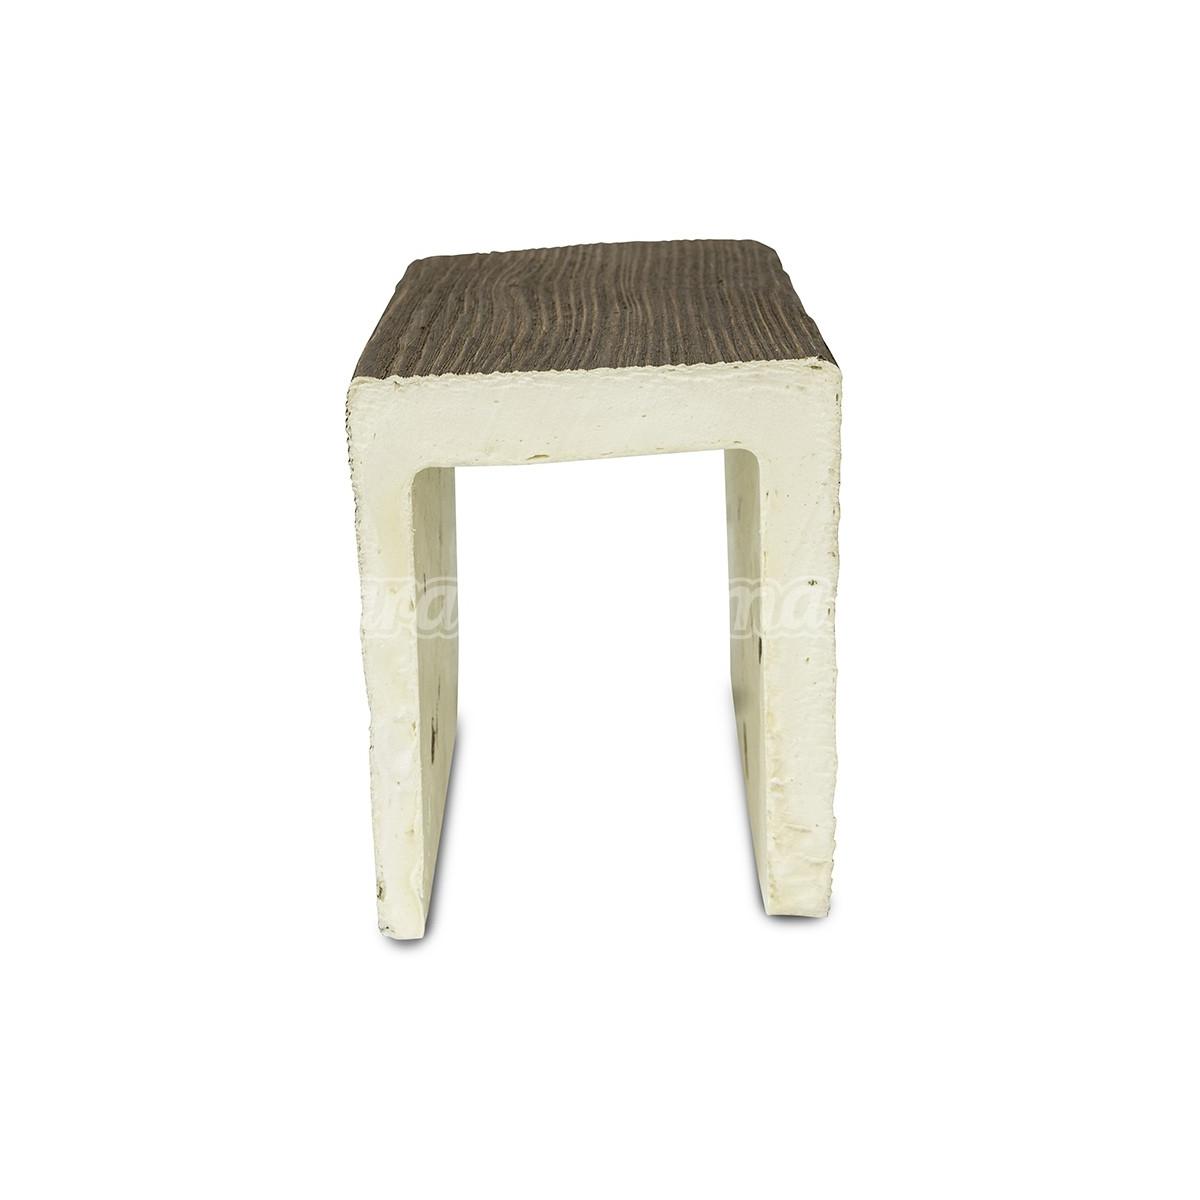 Grupo Unamacor Viga 300x15x18  imitación madera